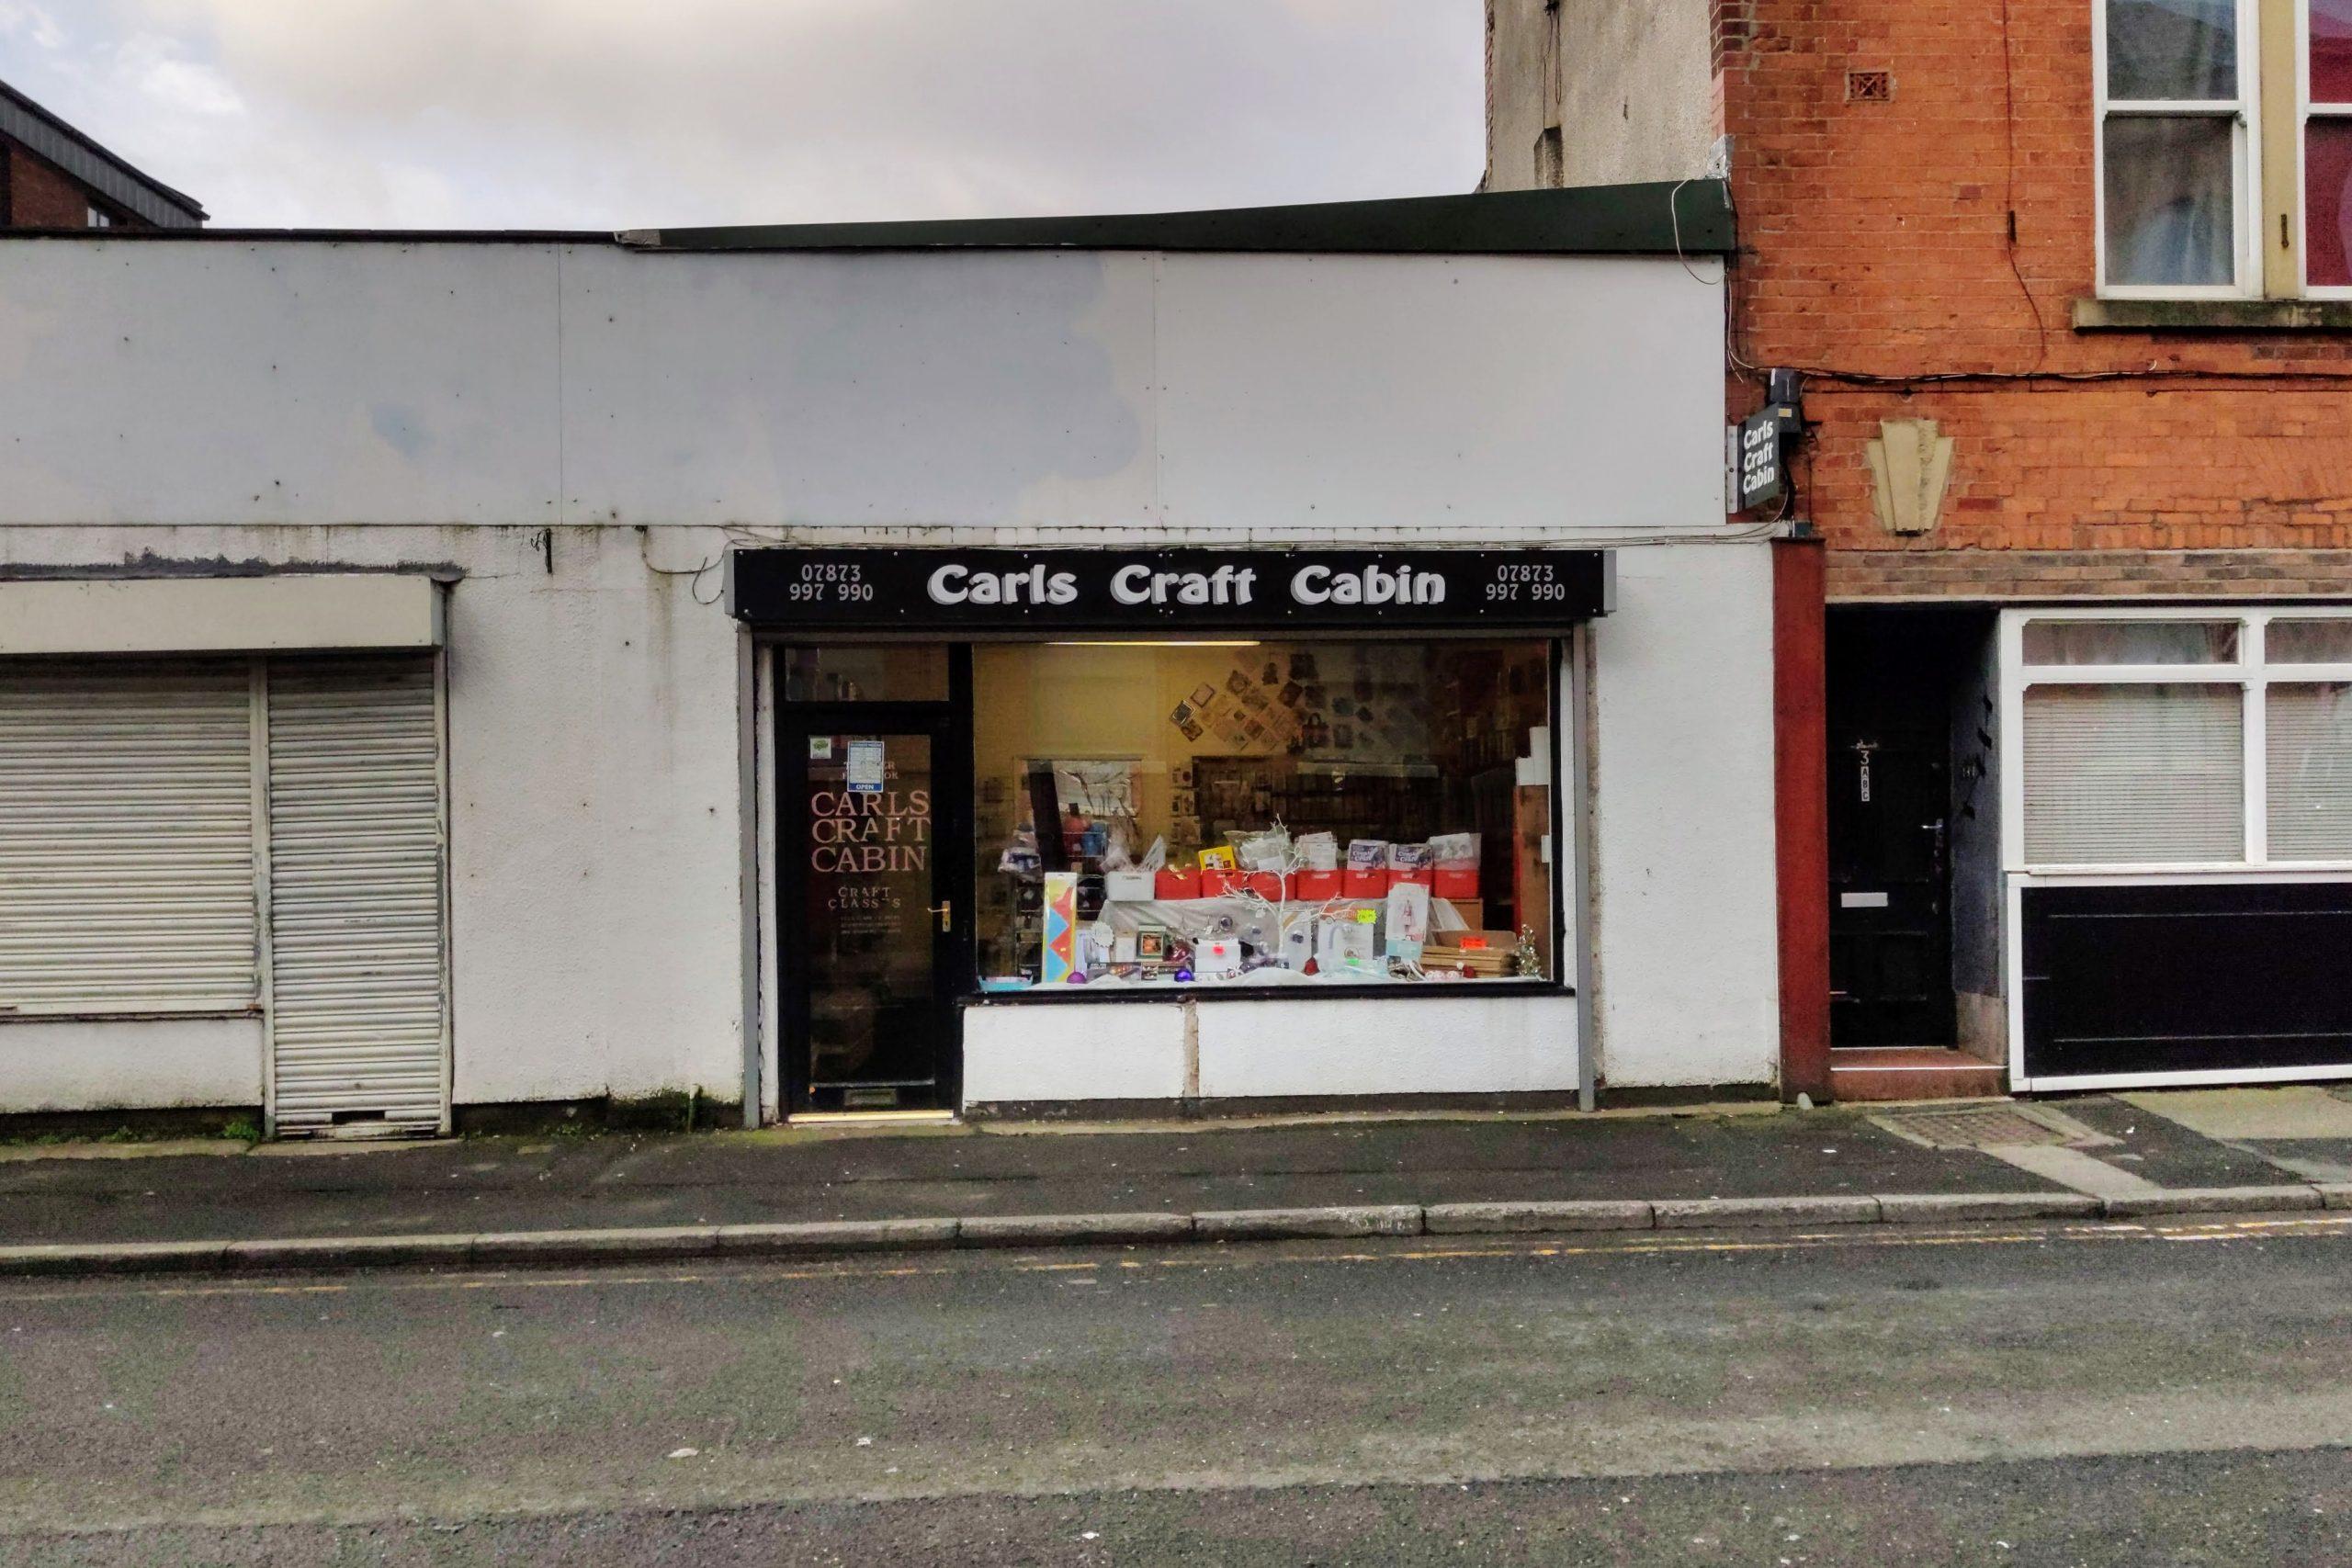 Carls Craft Cabin